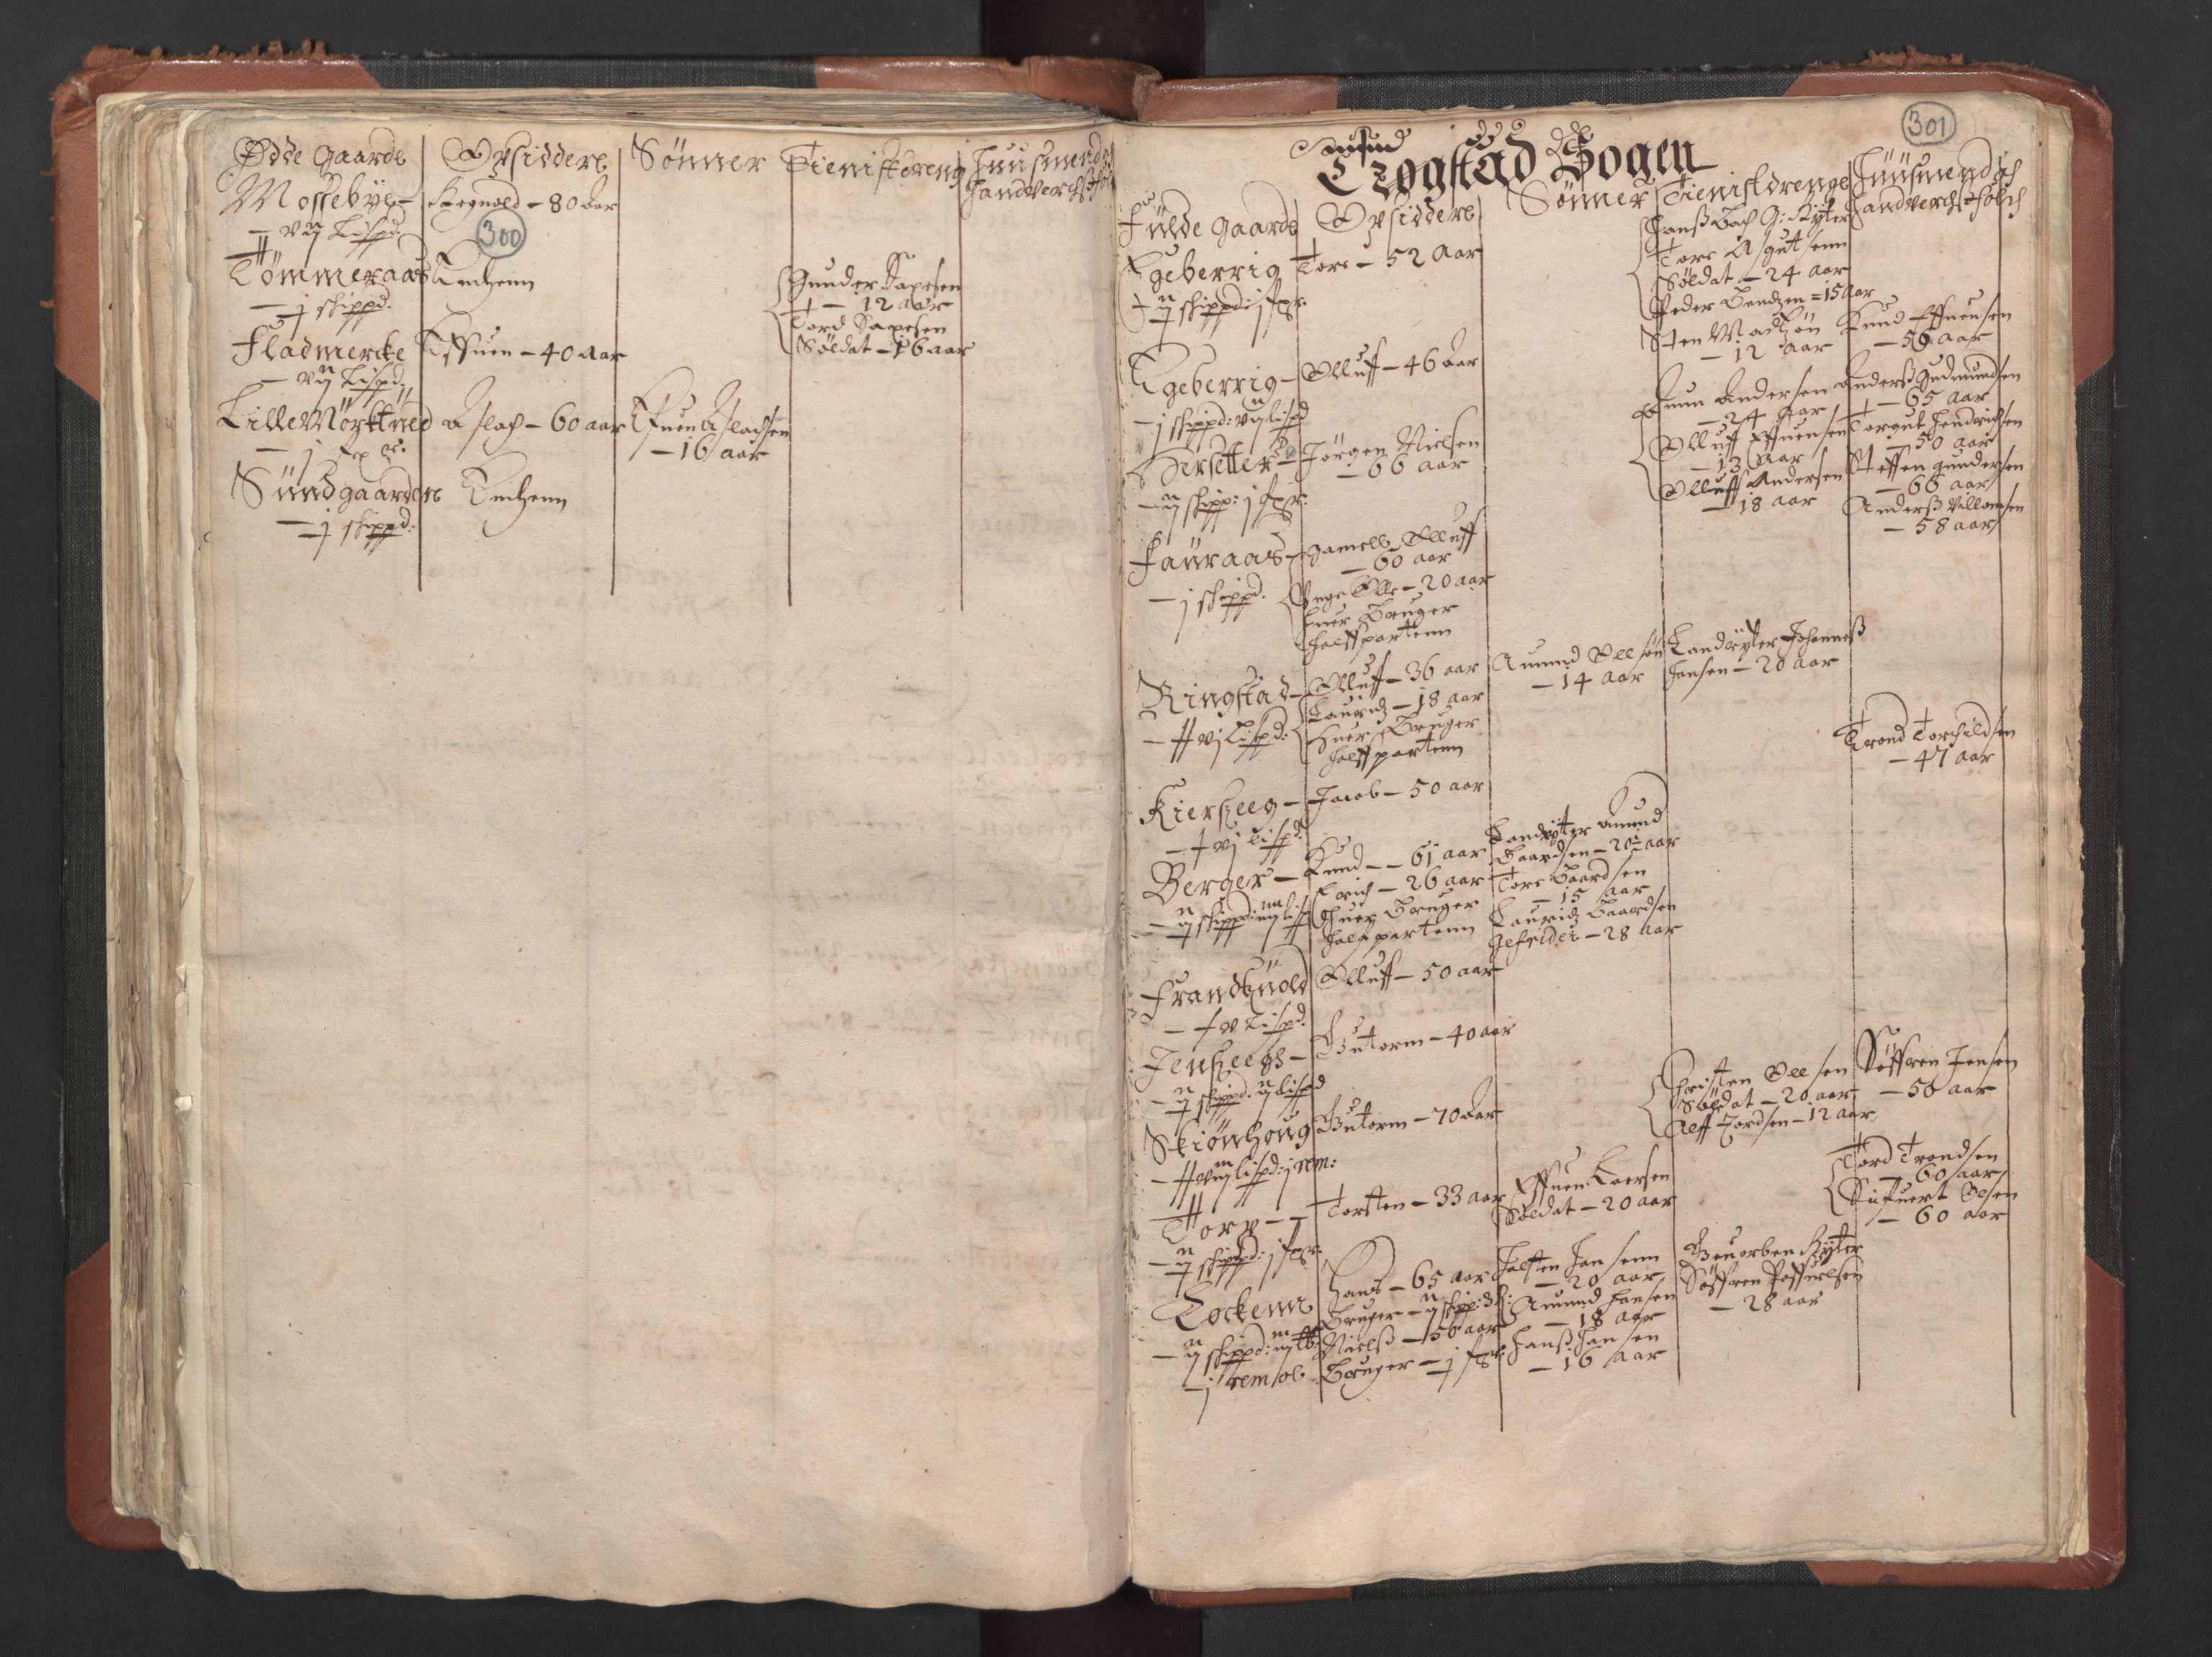 RA, Fogdenes og sorenskrivernes manntall 1664-1666, nr. 1: Fogderier (len og skipreider) i nåværende Østfold fylke, 1664, s. 300-301